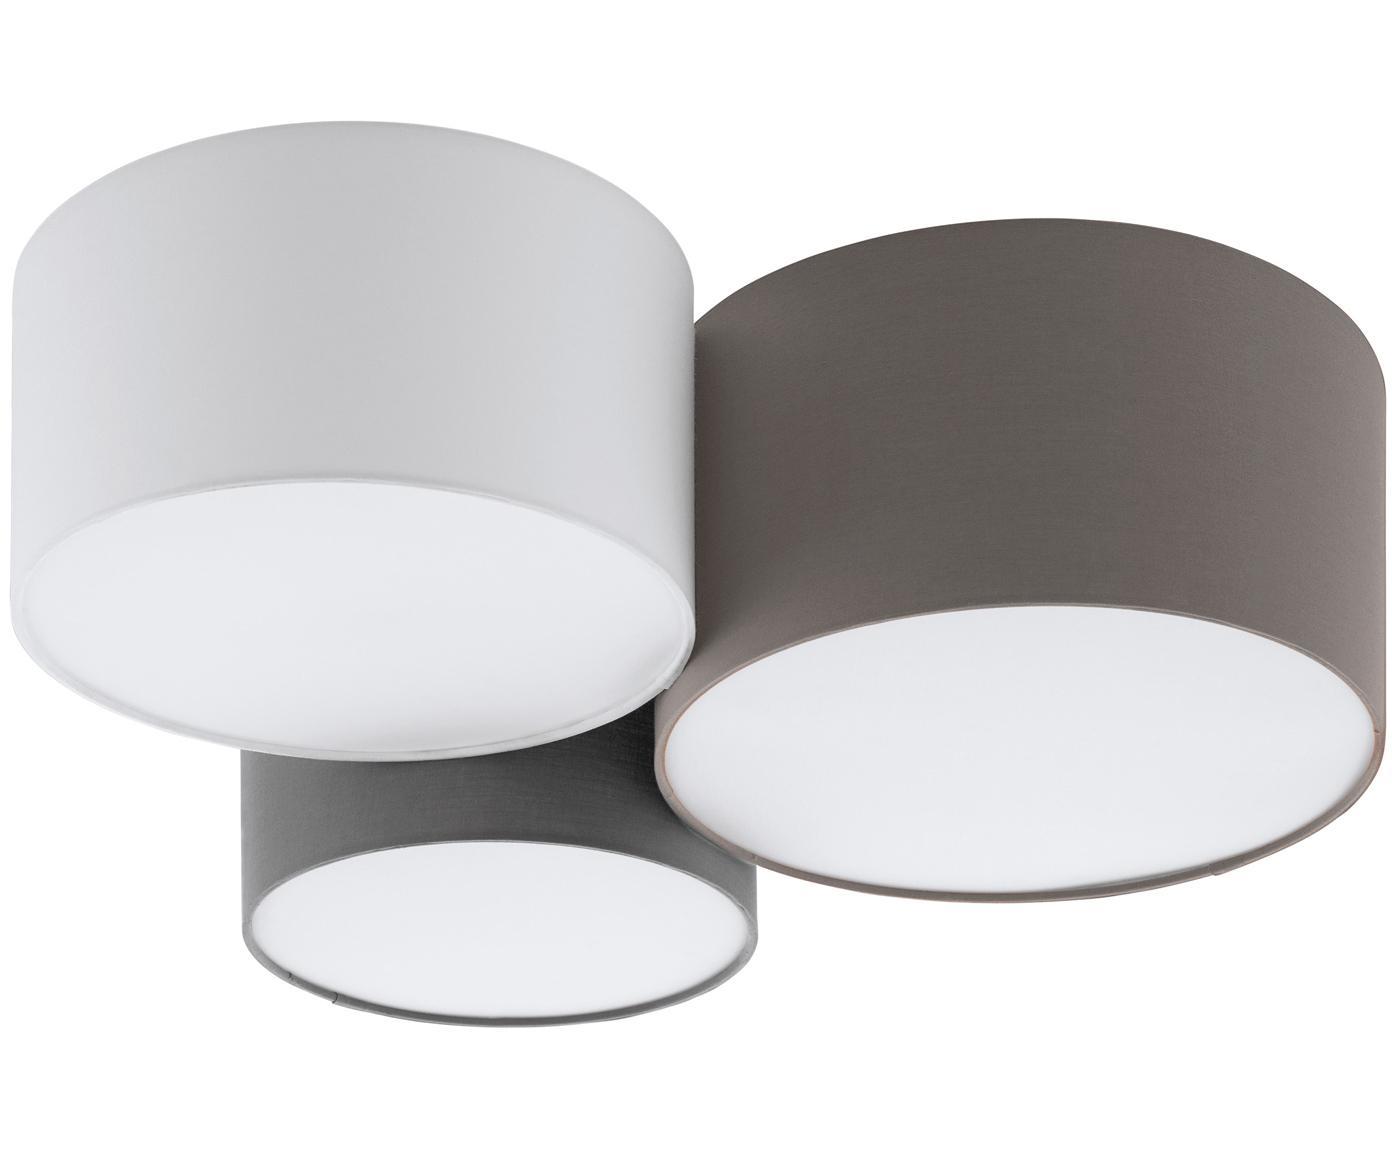 Plafón Pastore, Marrón, gris, blanco, Ø 61 x Al 26 cm